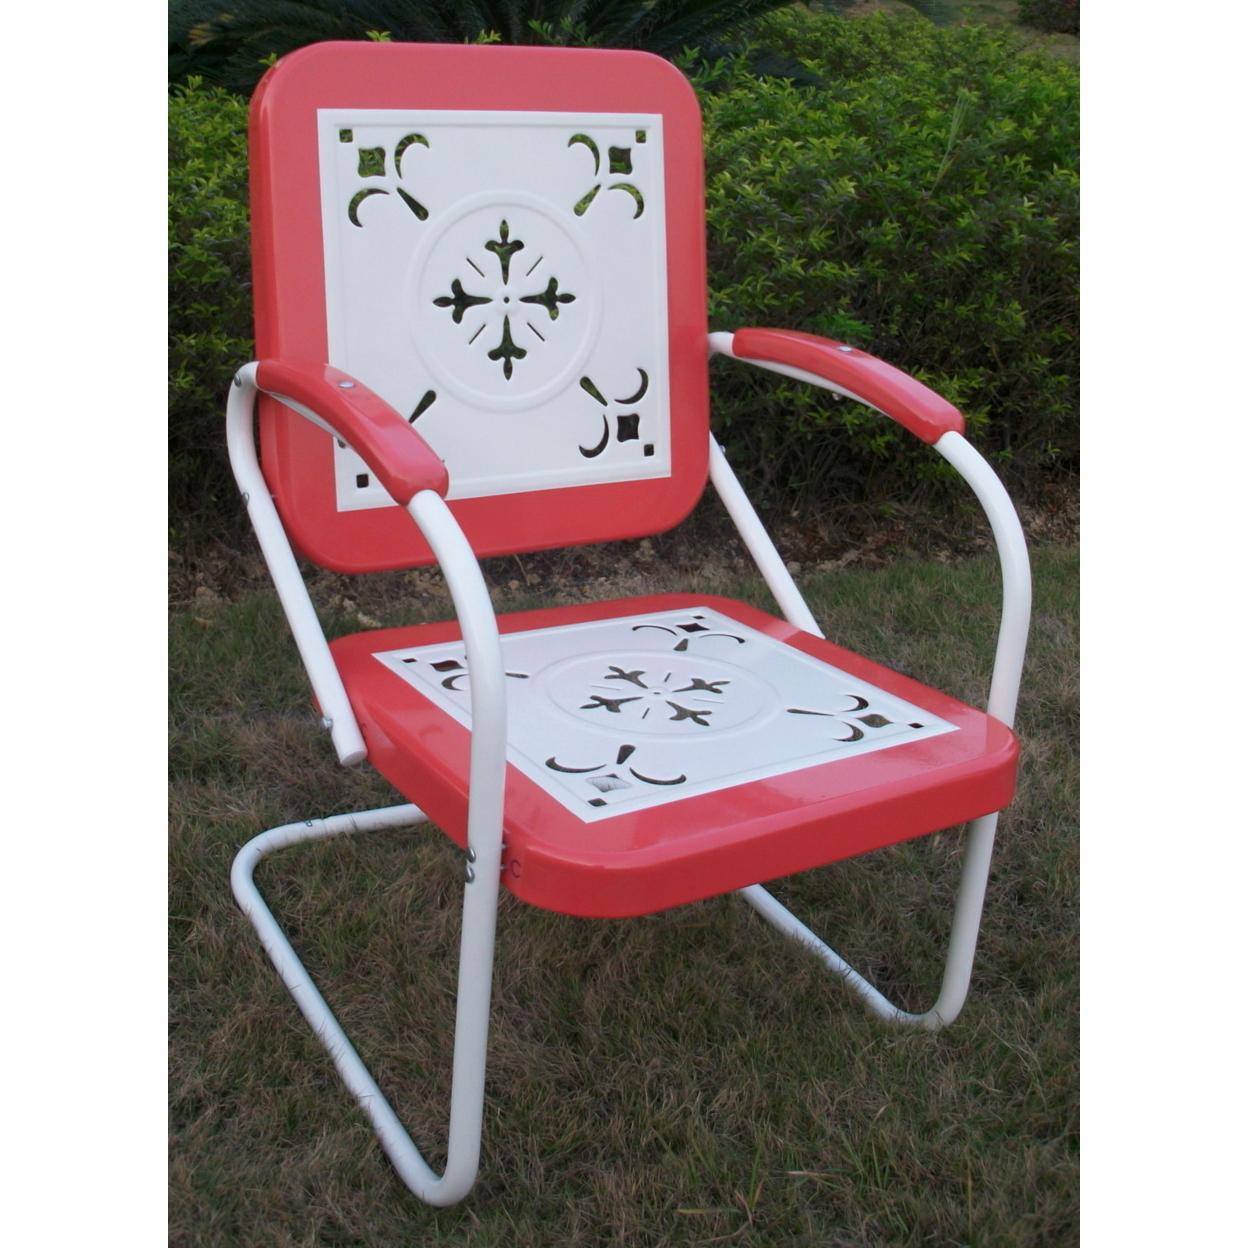 Metal Chair Retro 58995192c98fc433fb5822a6